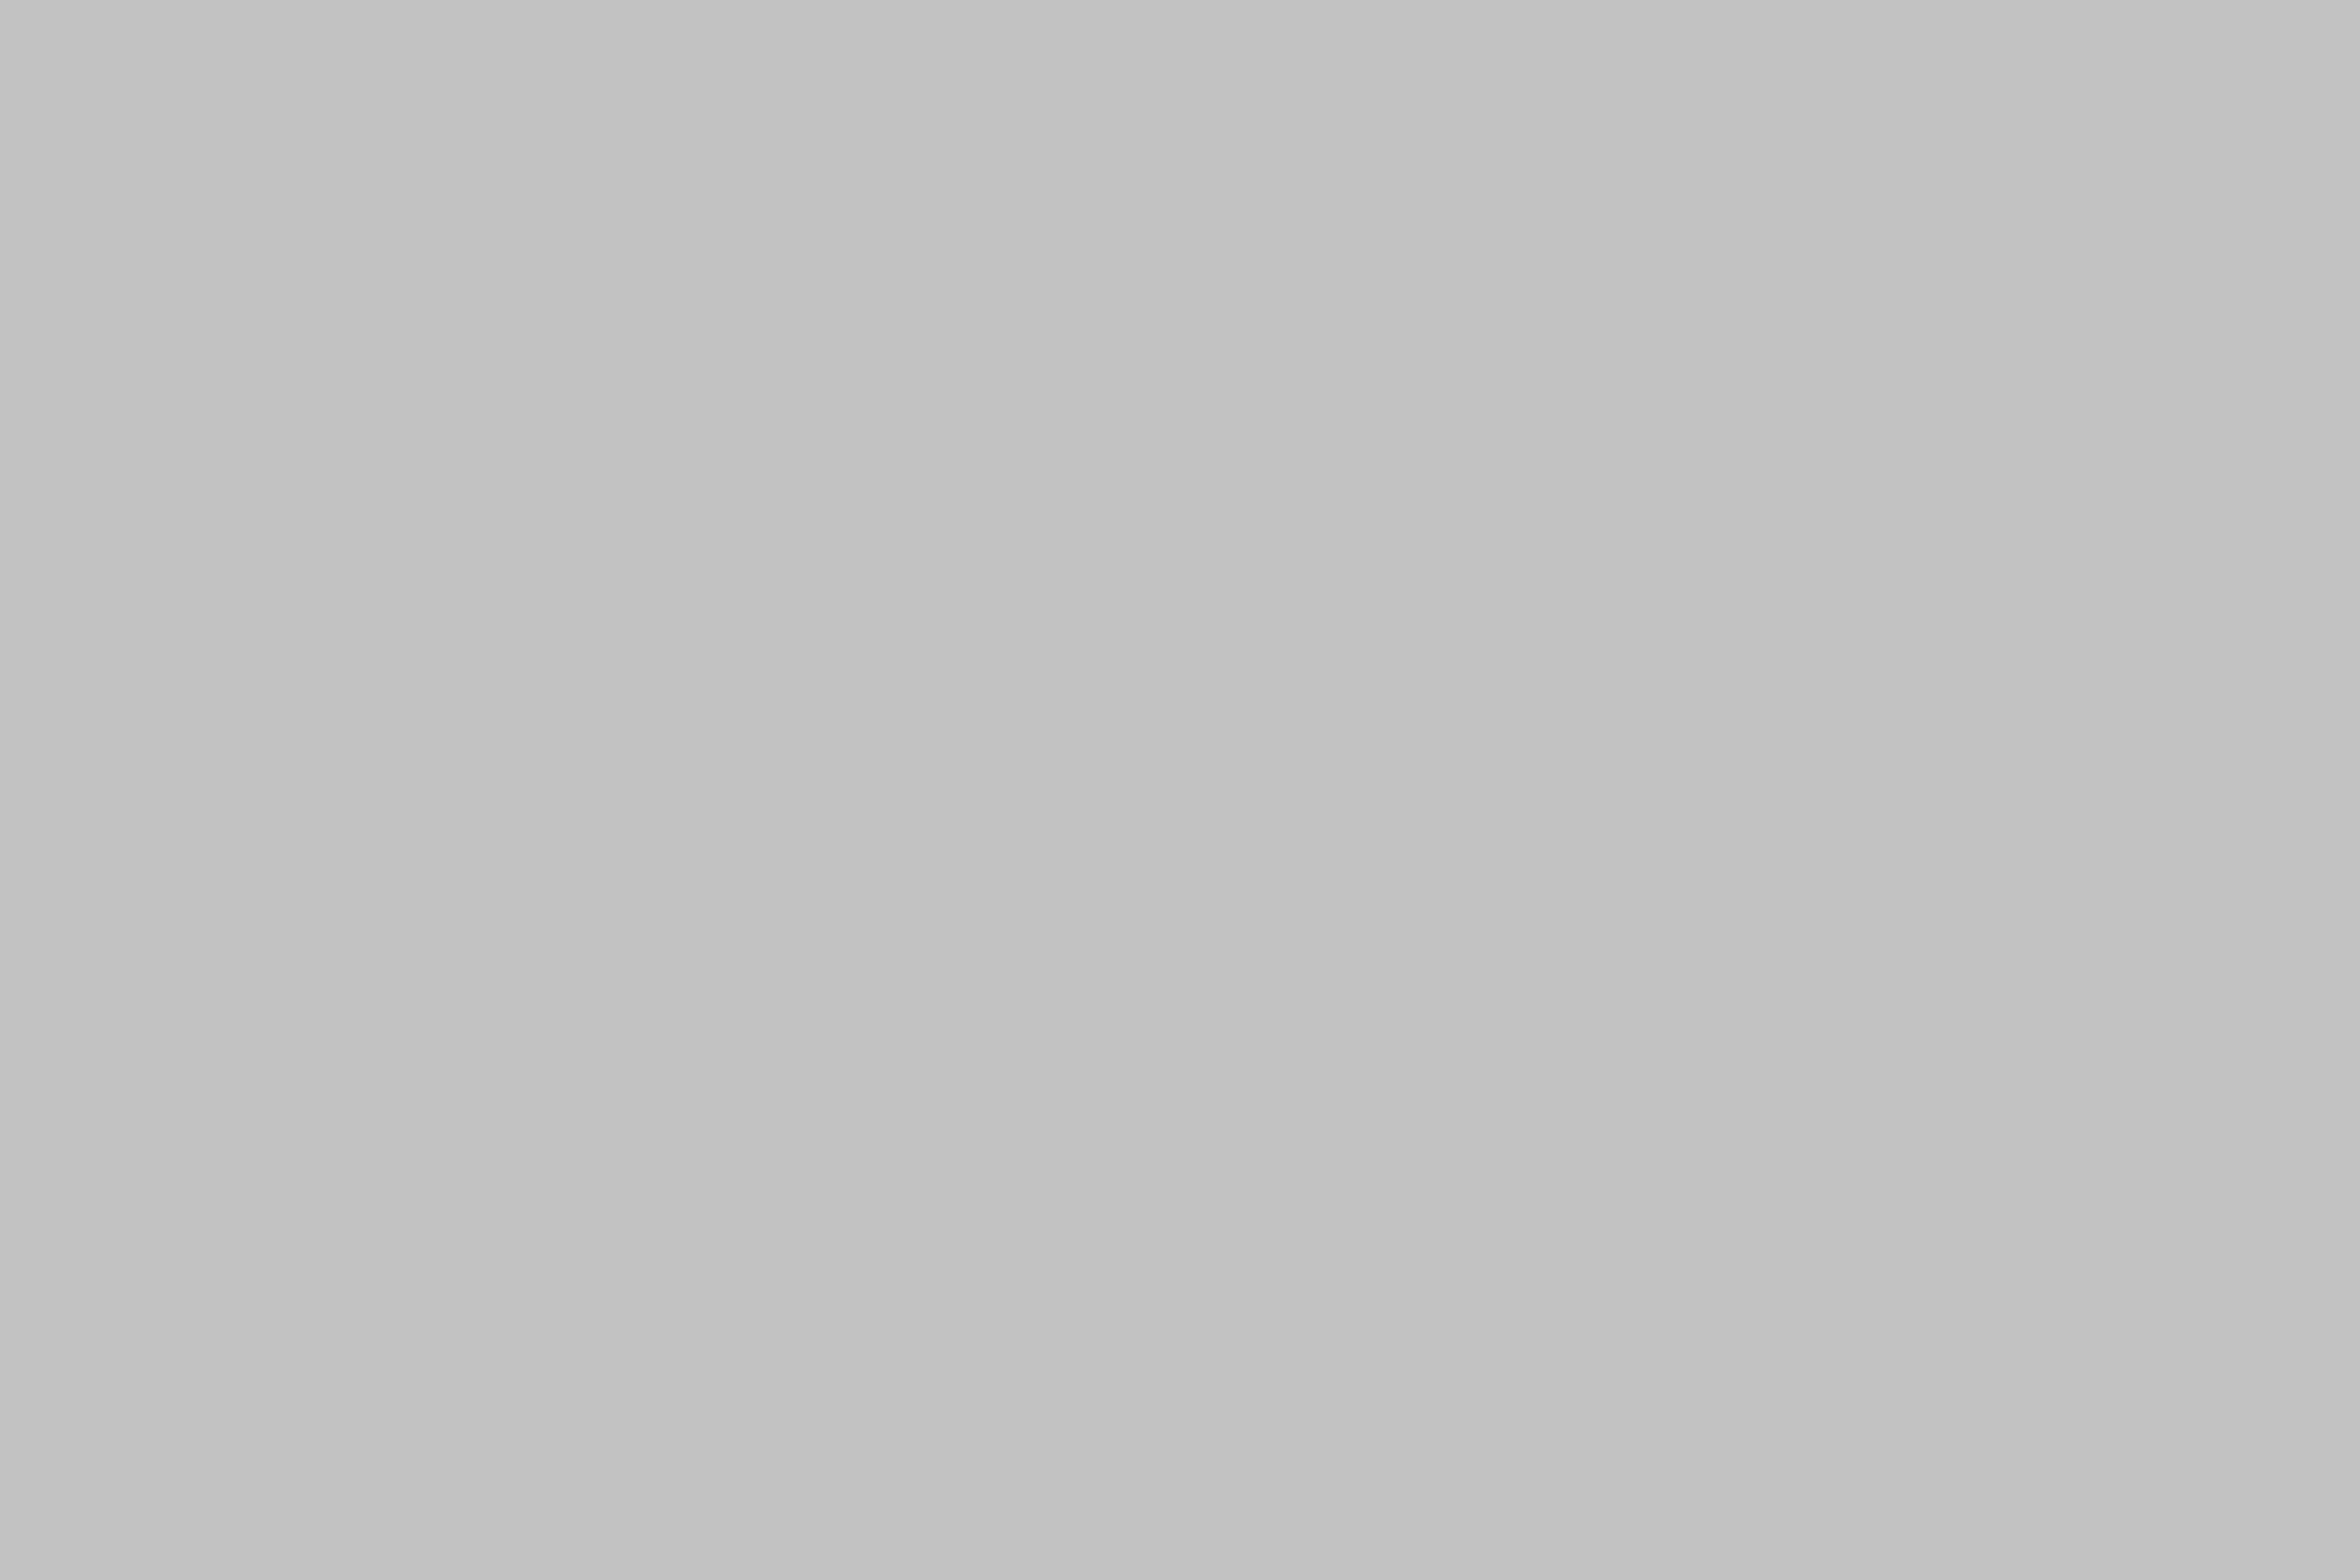 SquareSpace-SermonSeries copy 3.jpg